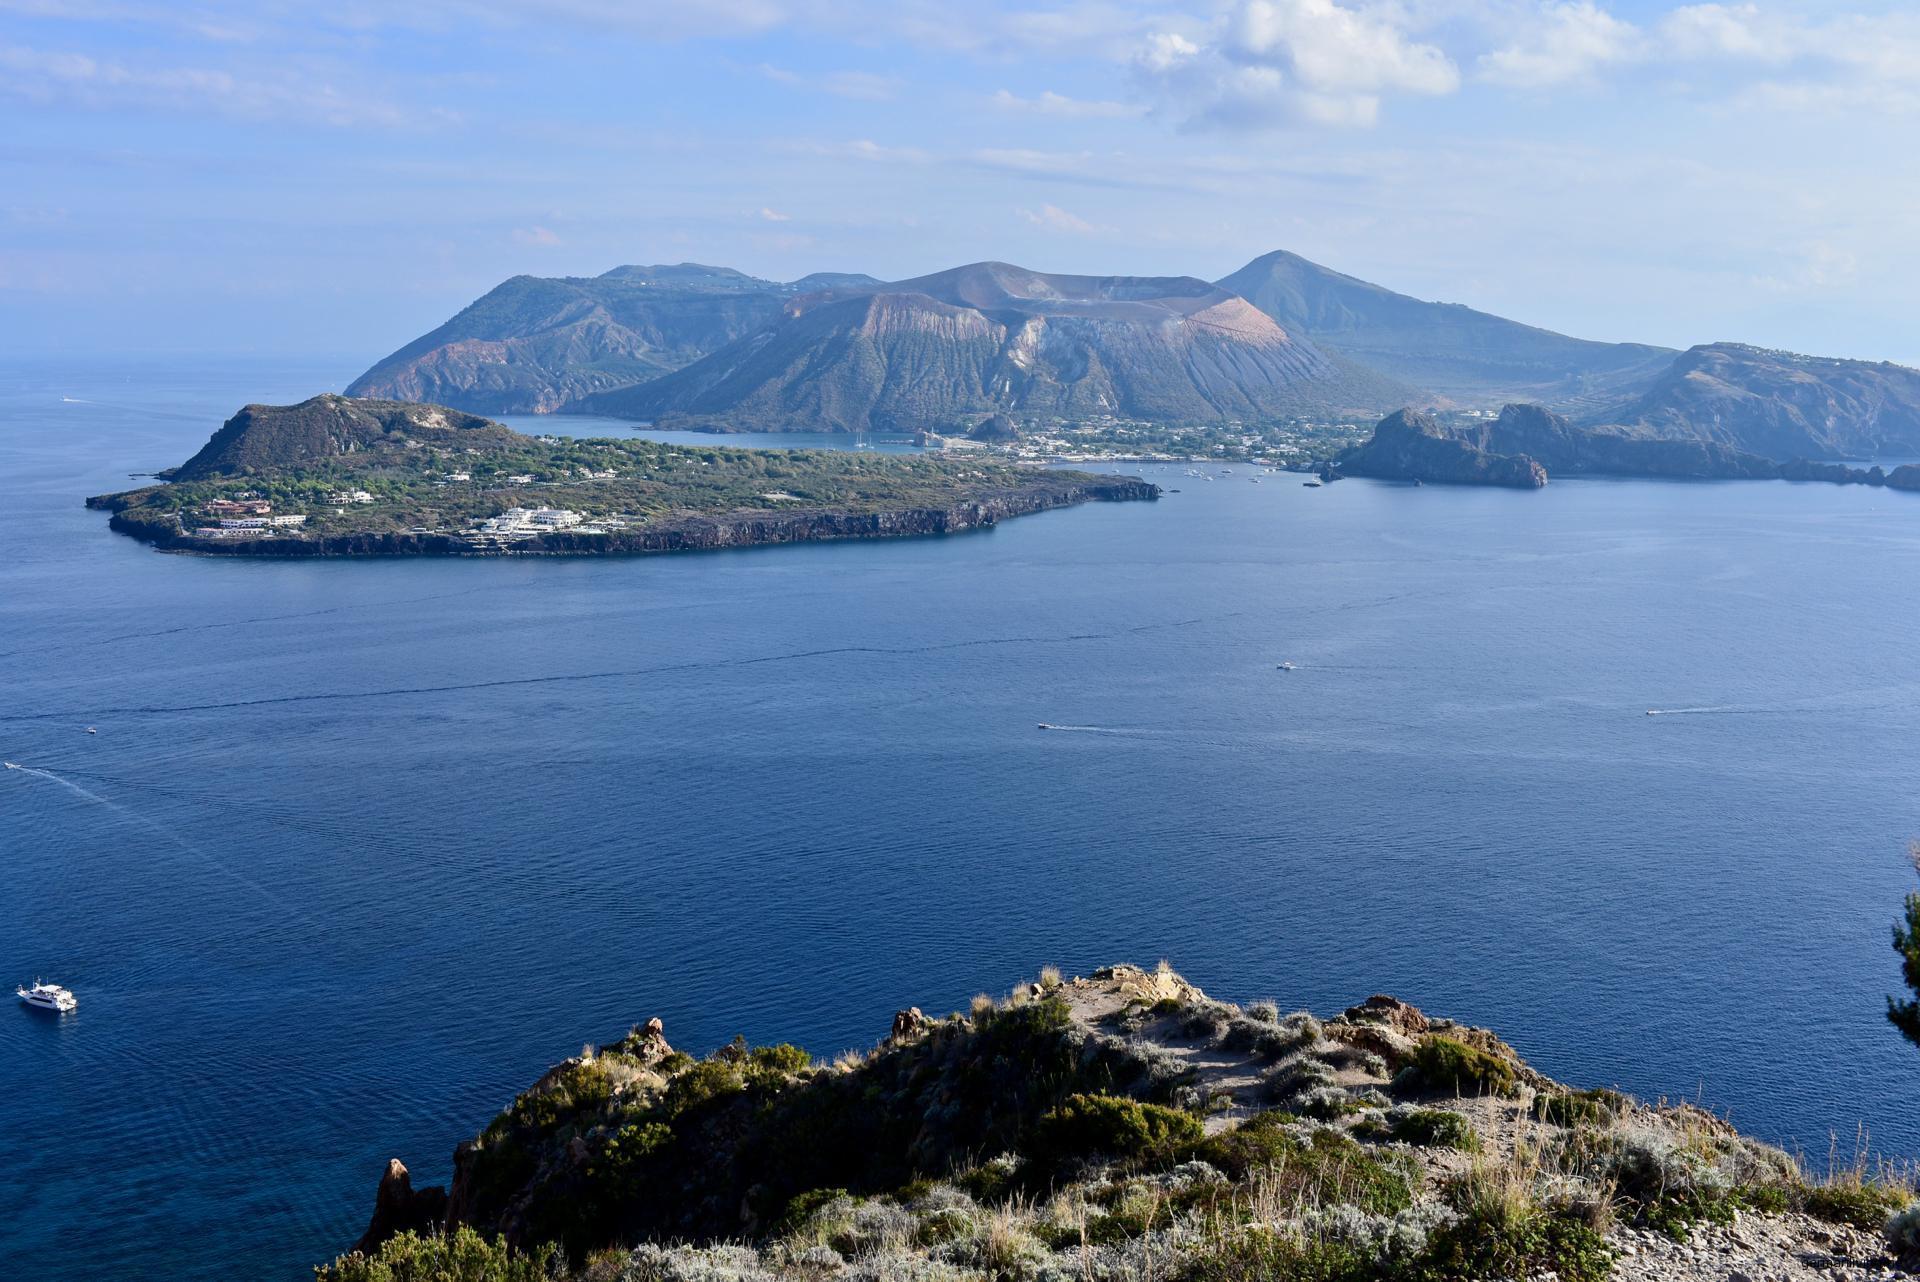 Vulcano Liparische Inseln